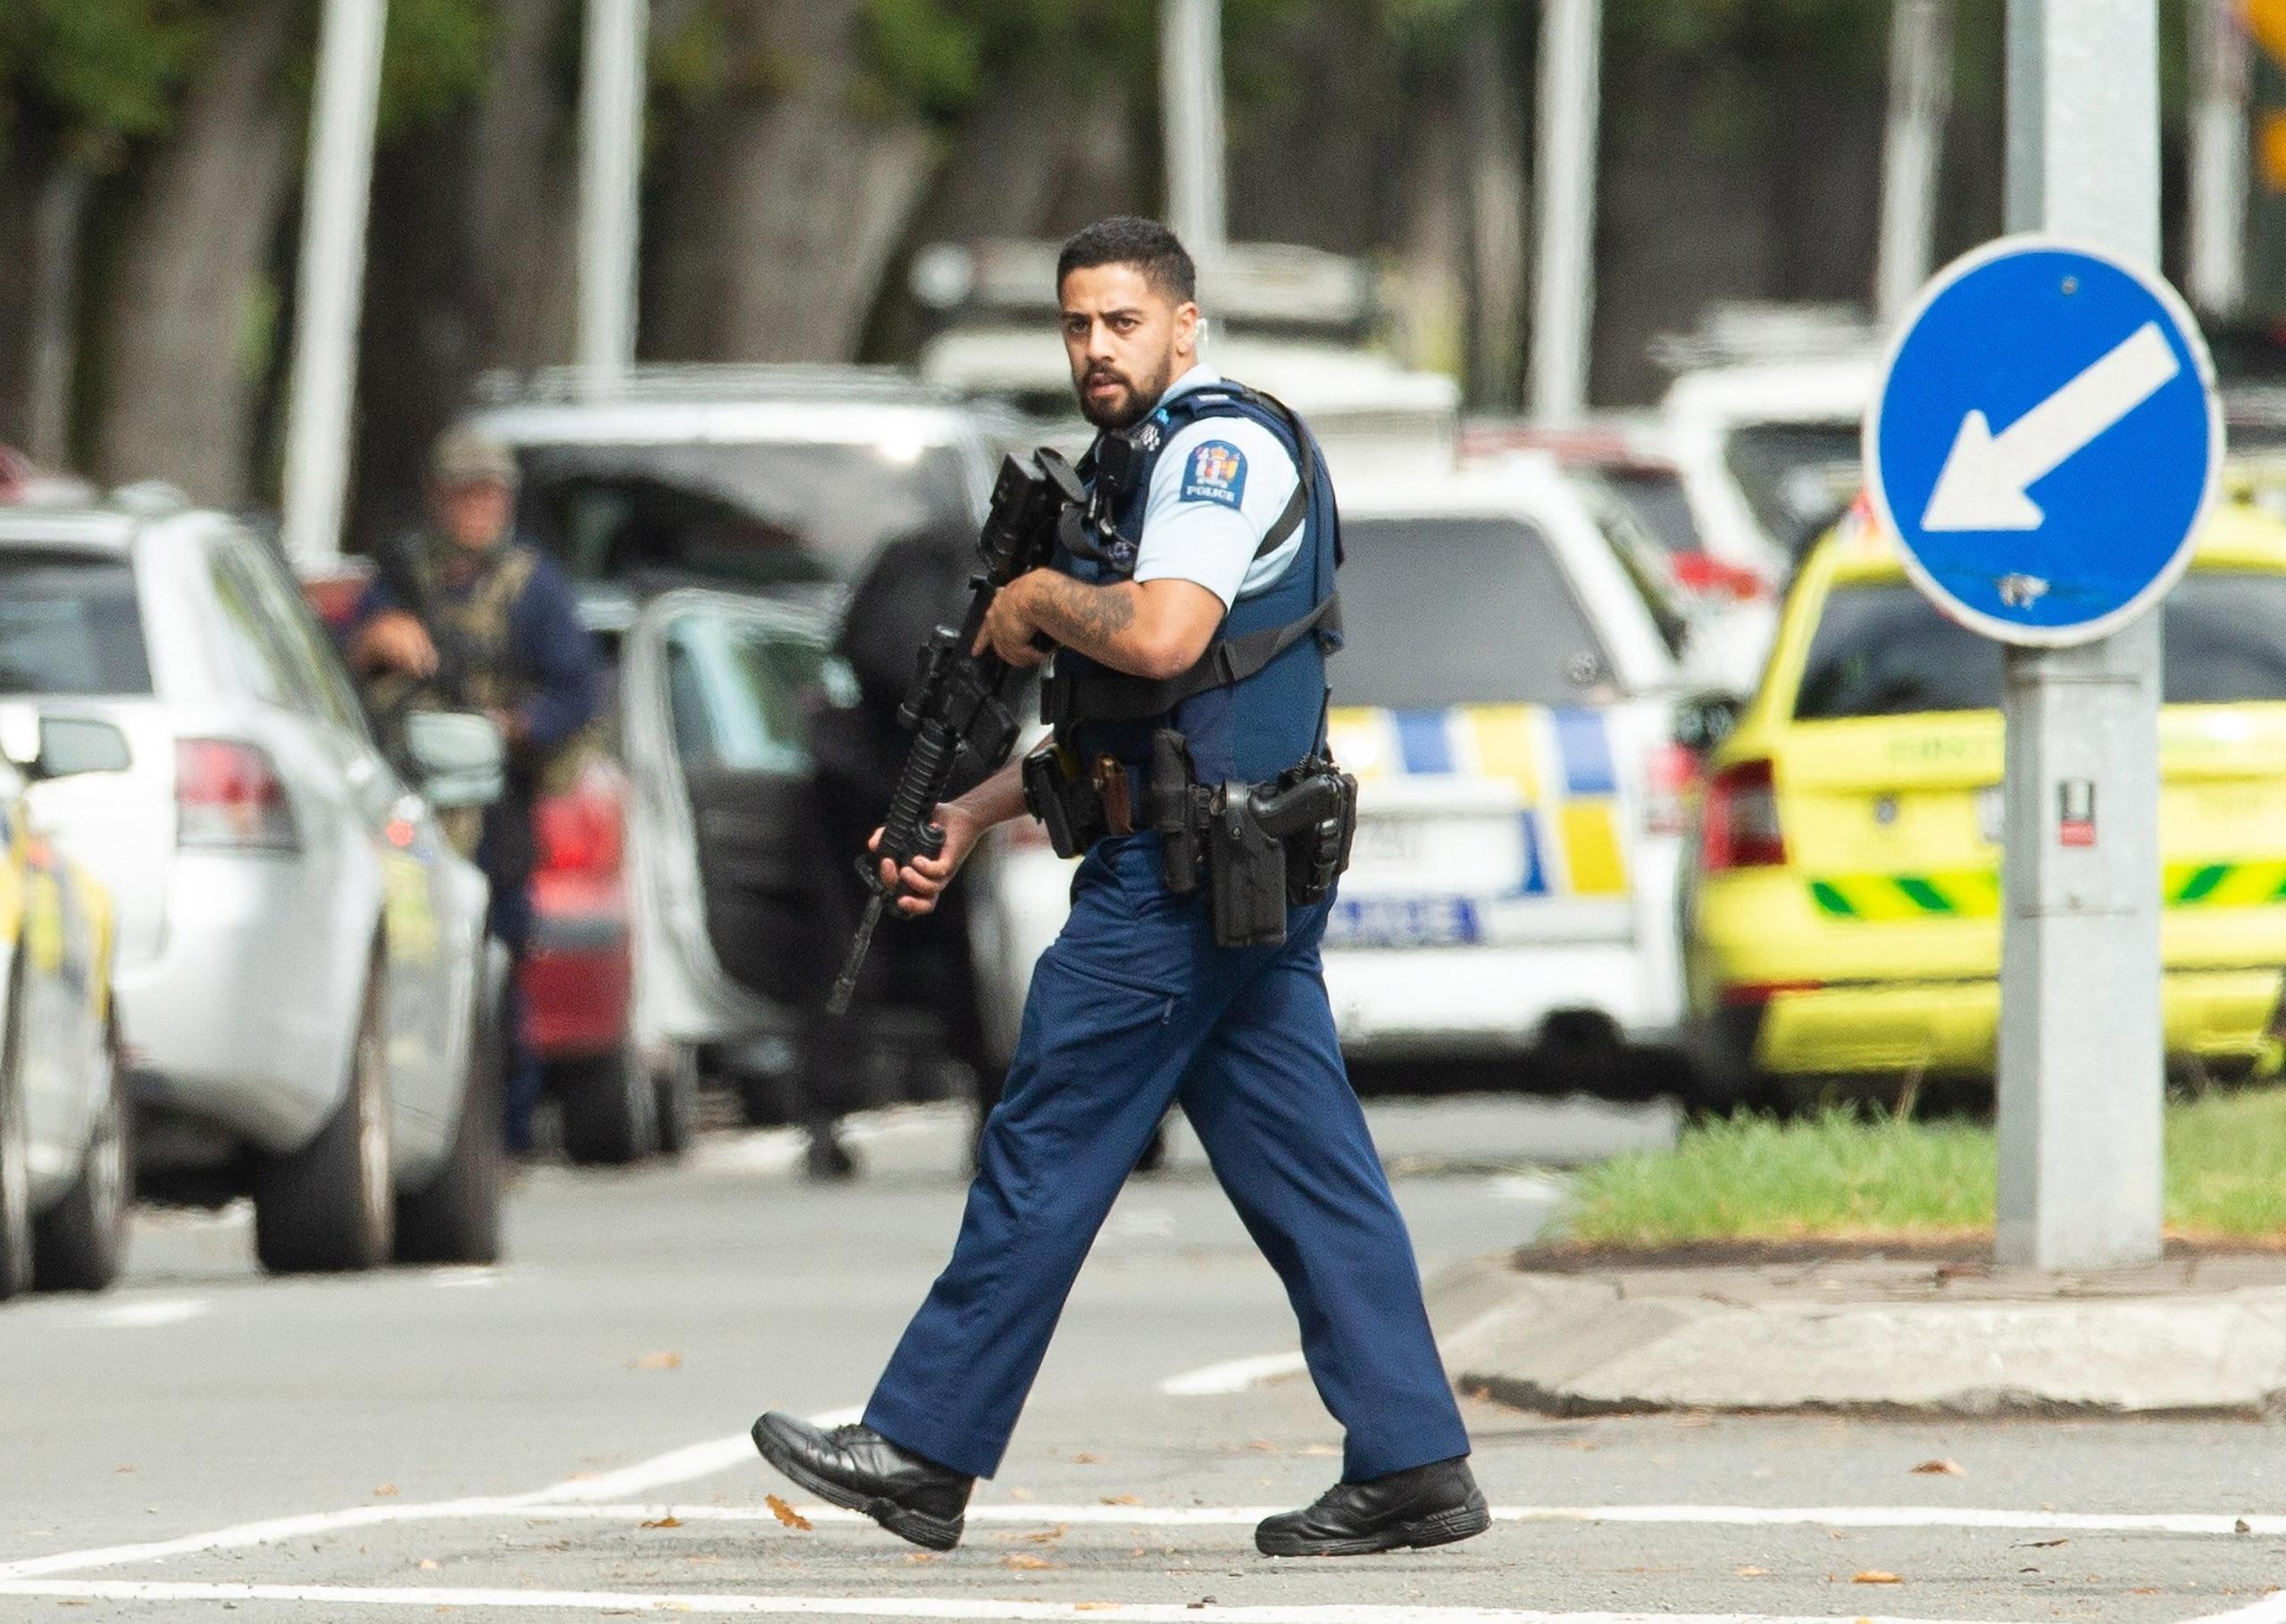 Nuova Zelanda: sinagoghe restano chiuse